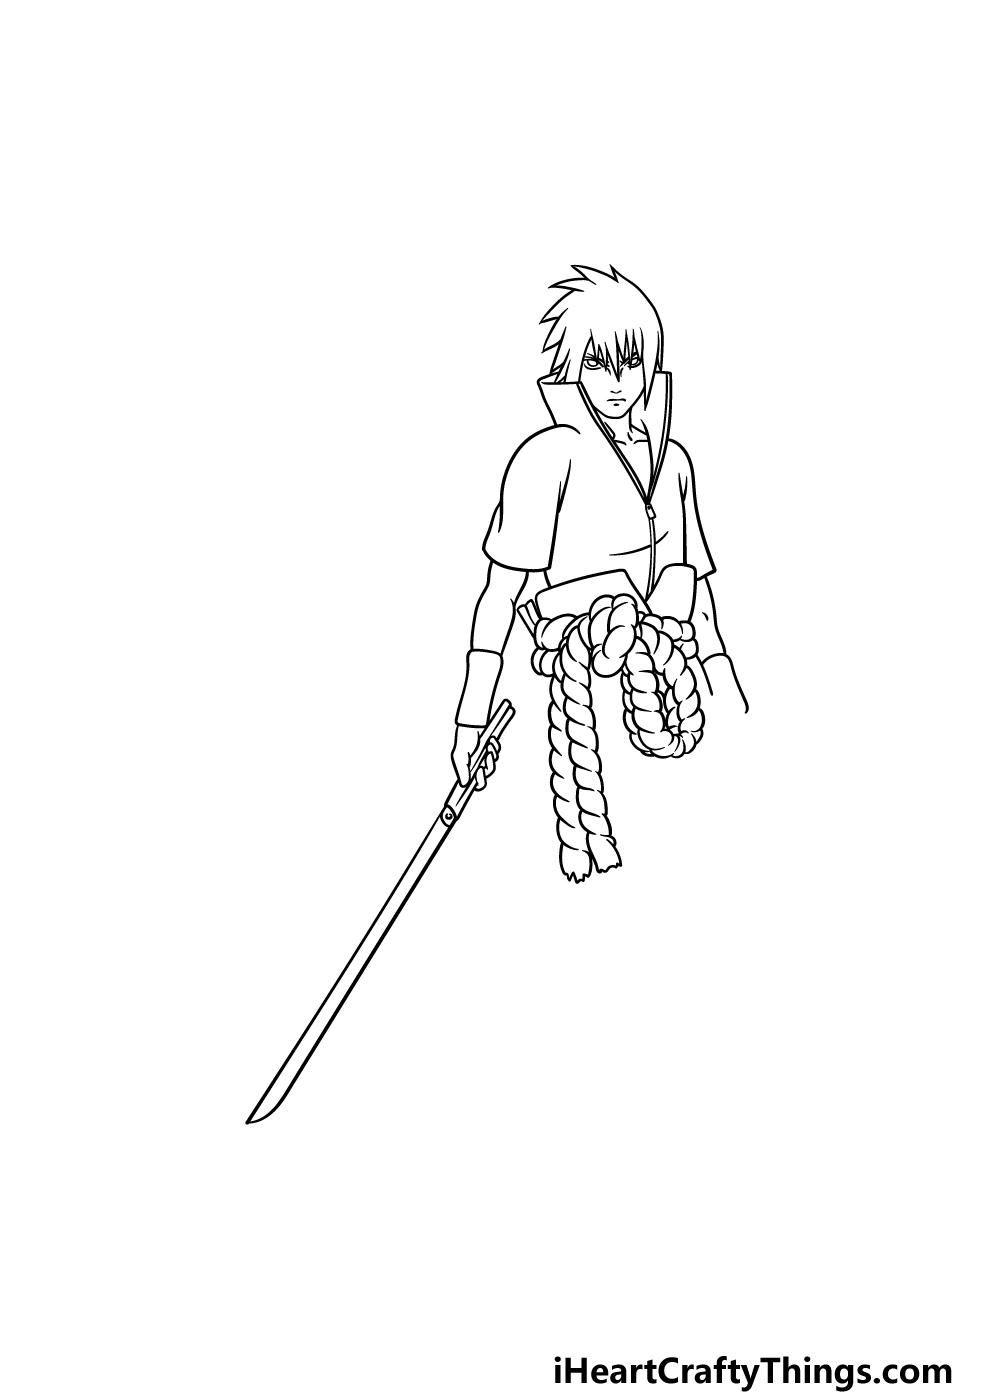 drawing Sasuke step 4